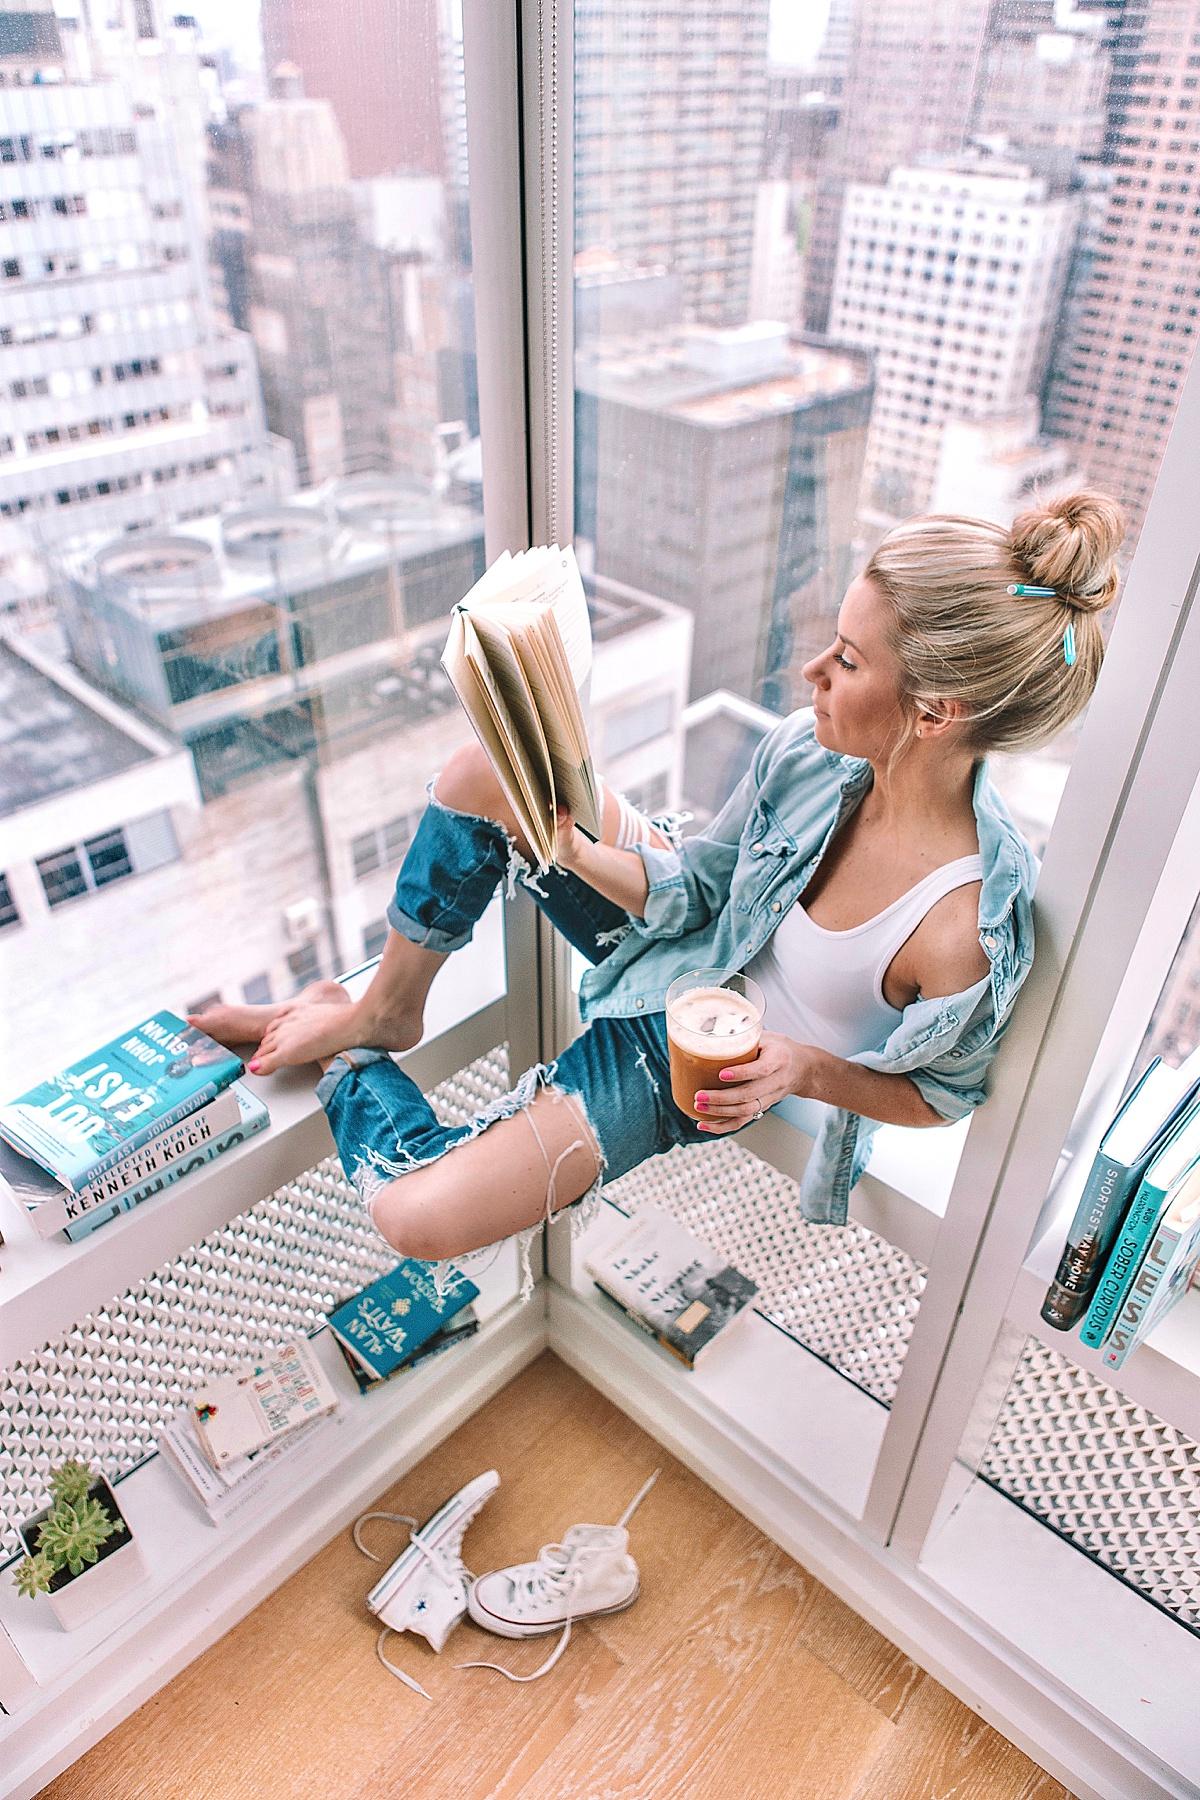 olivia rink, olivia rink apartment, new york city, nyc apartment, new york city apartment, lifestyle blog, nyc lifestyle blogger